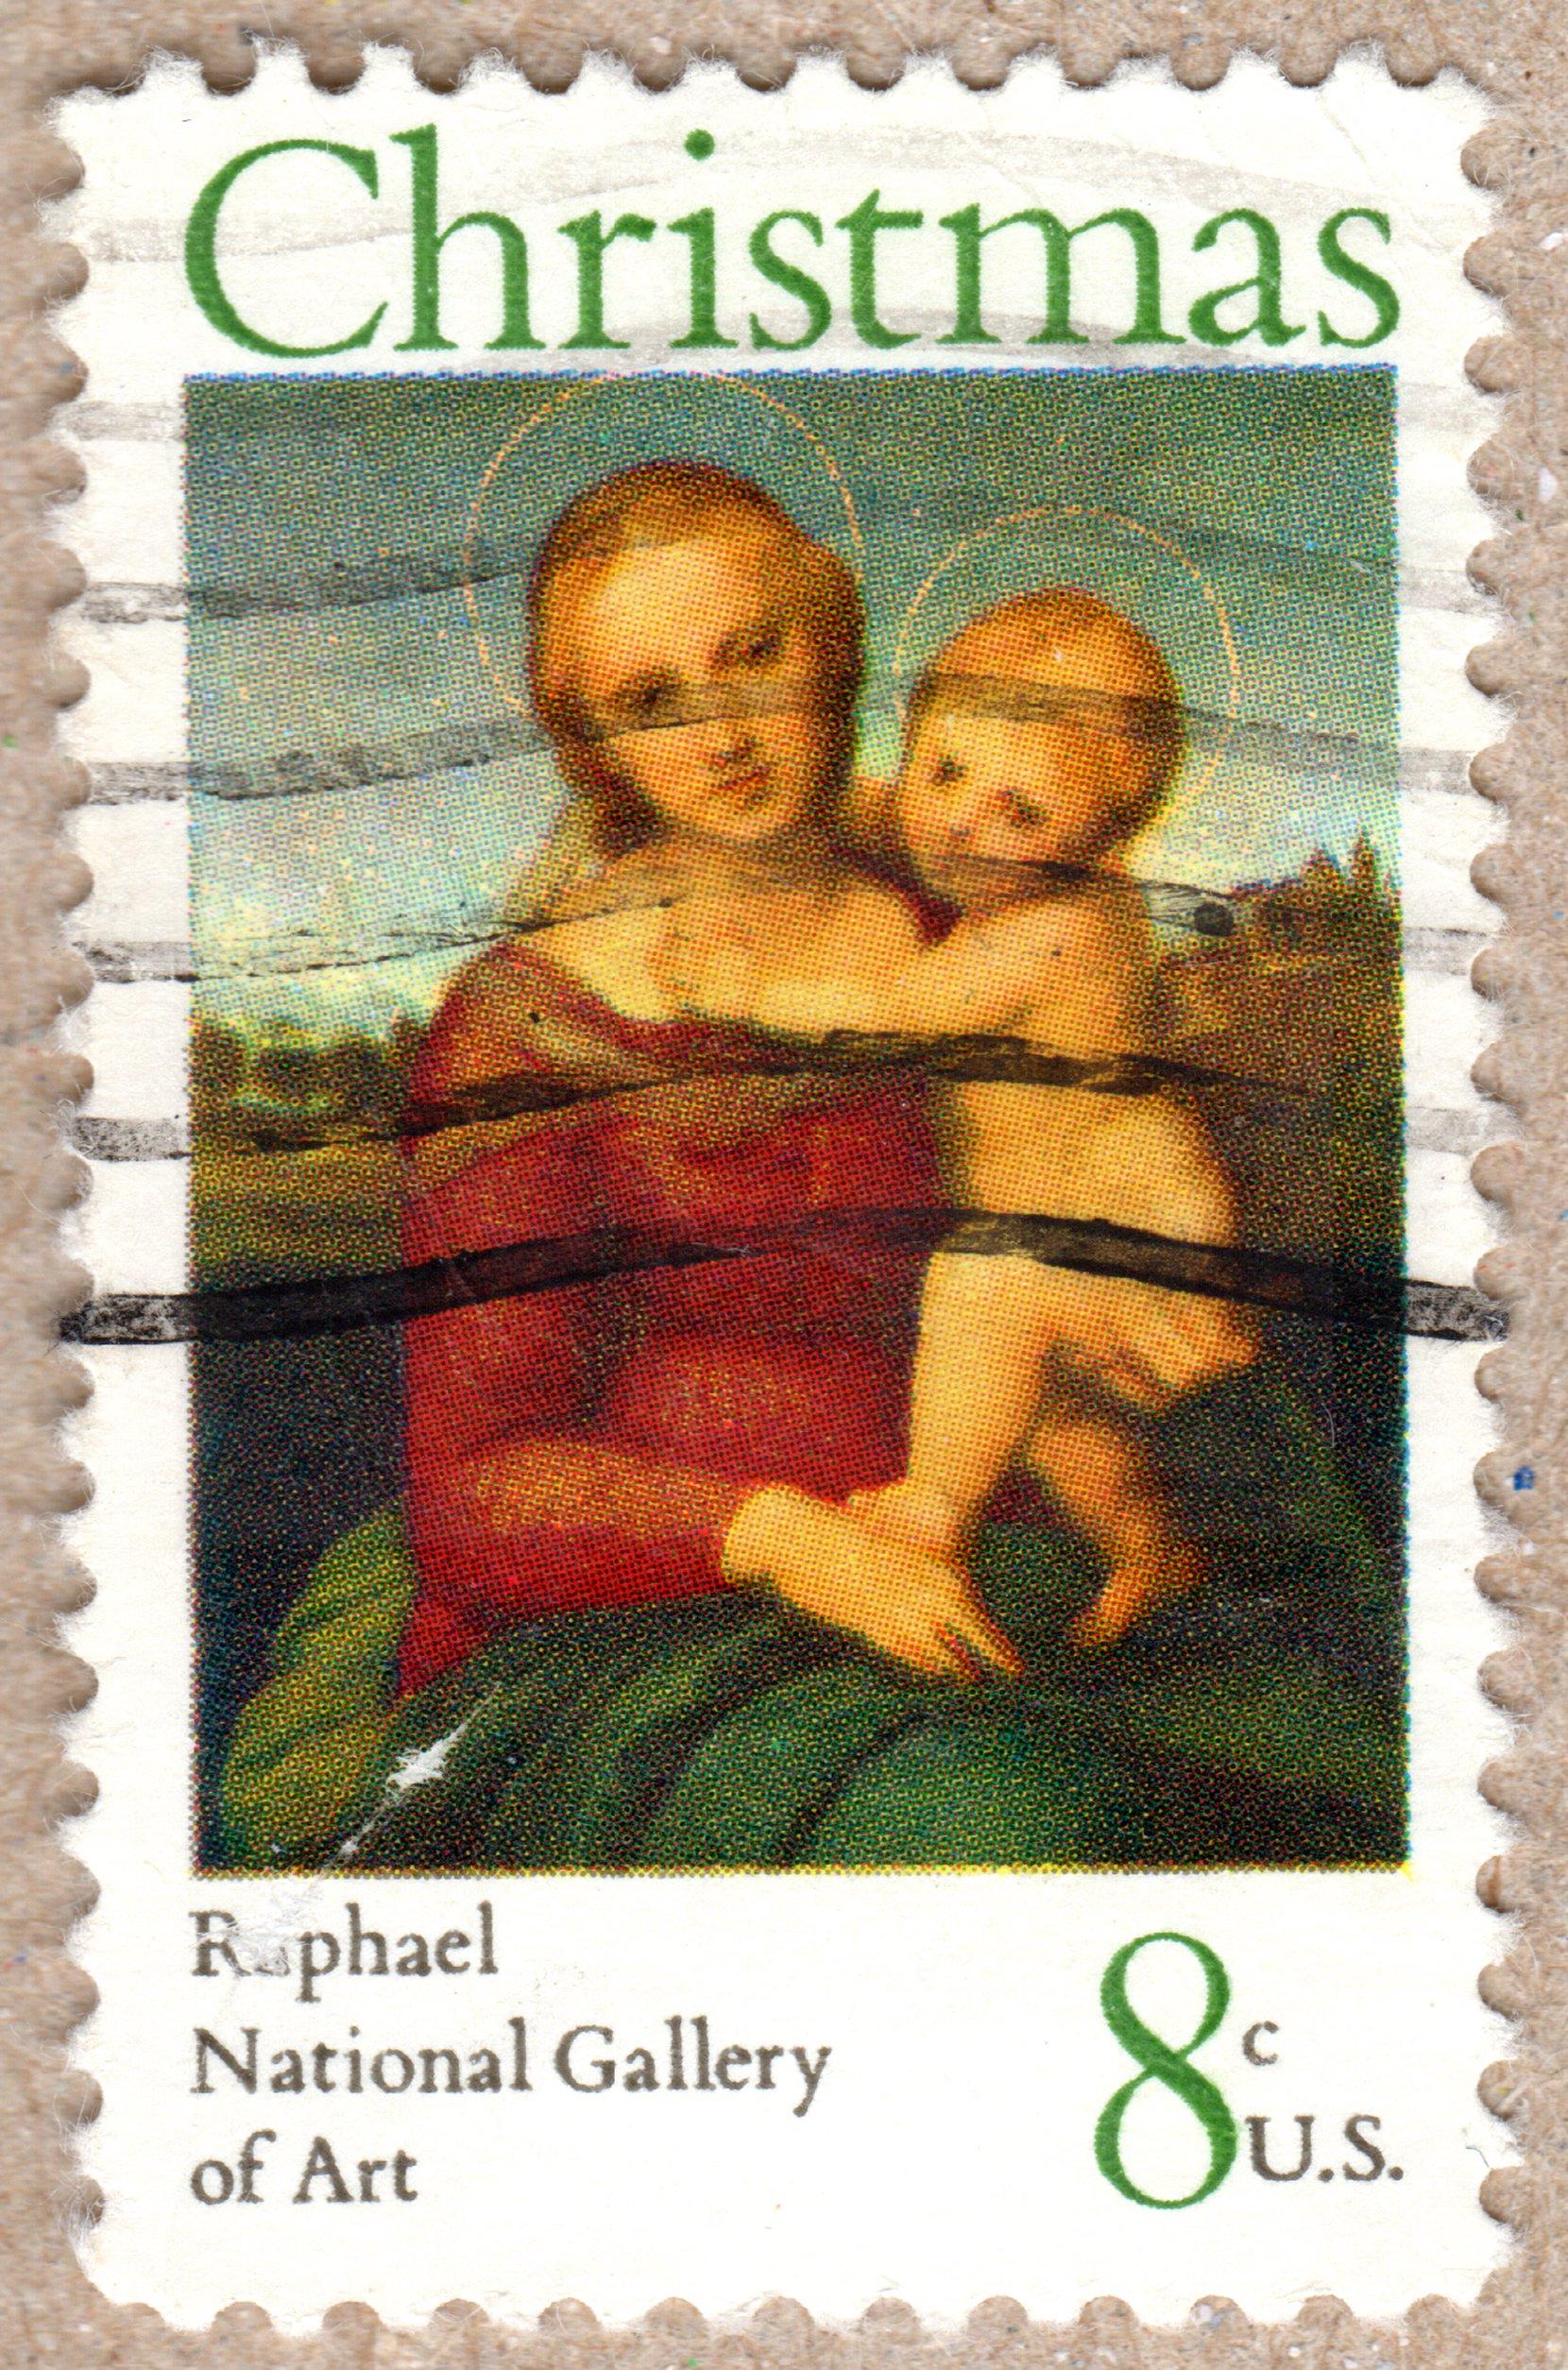 copy of christmas, raphael, u.s. 8¢ stamp philately postage stamps